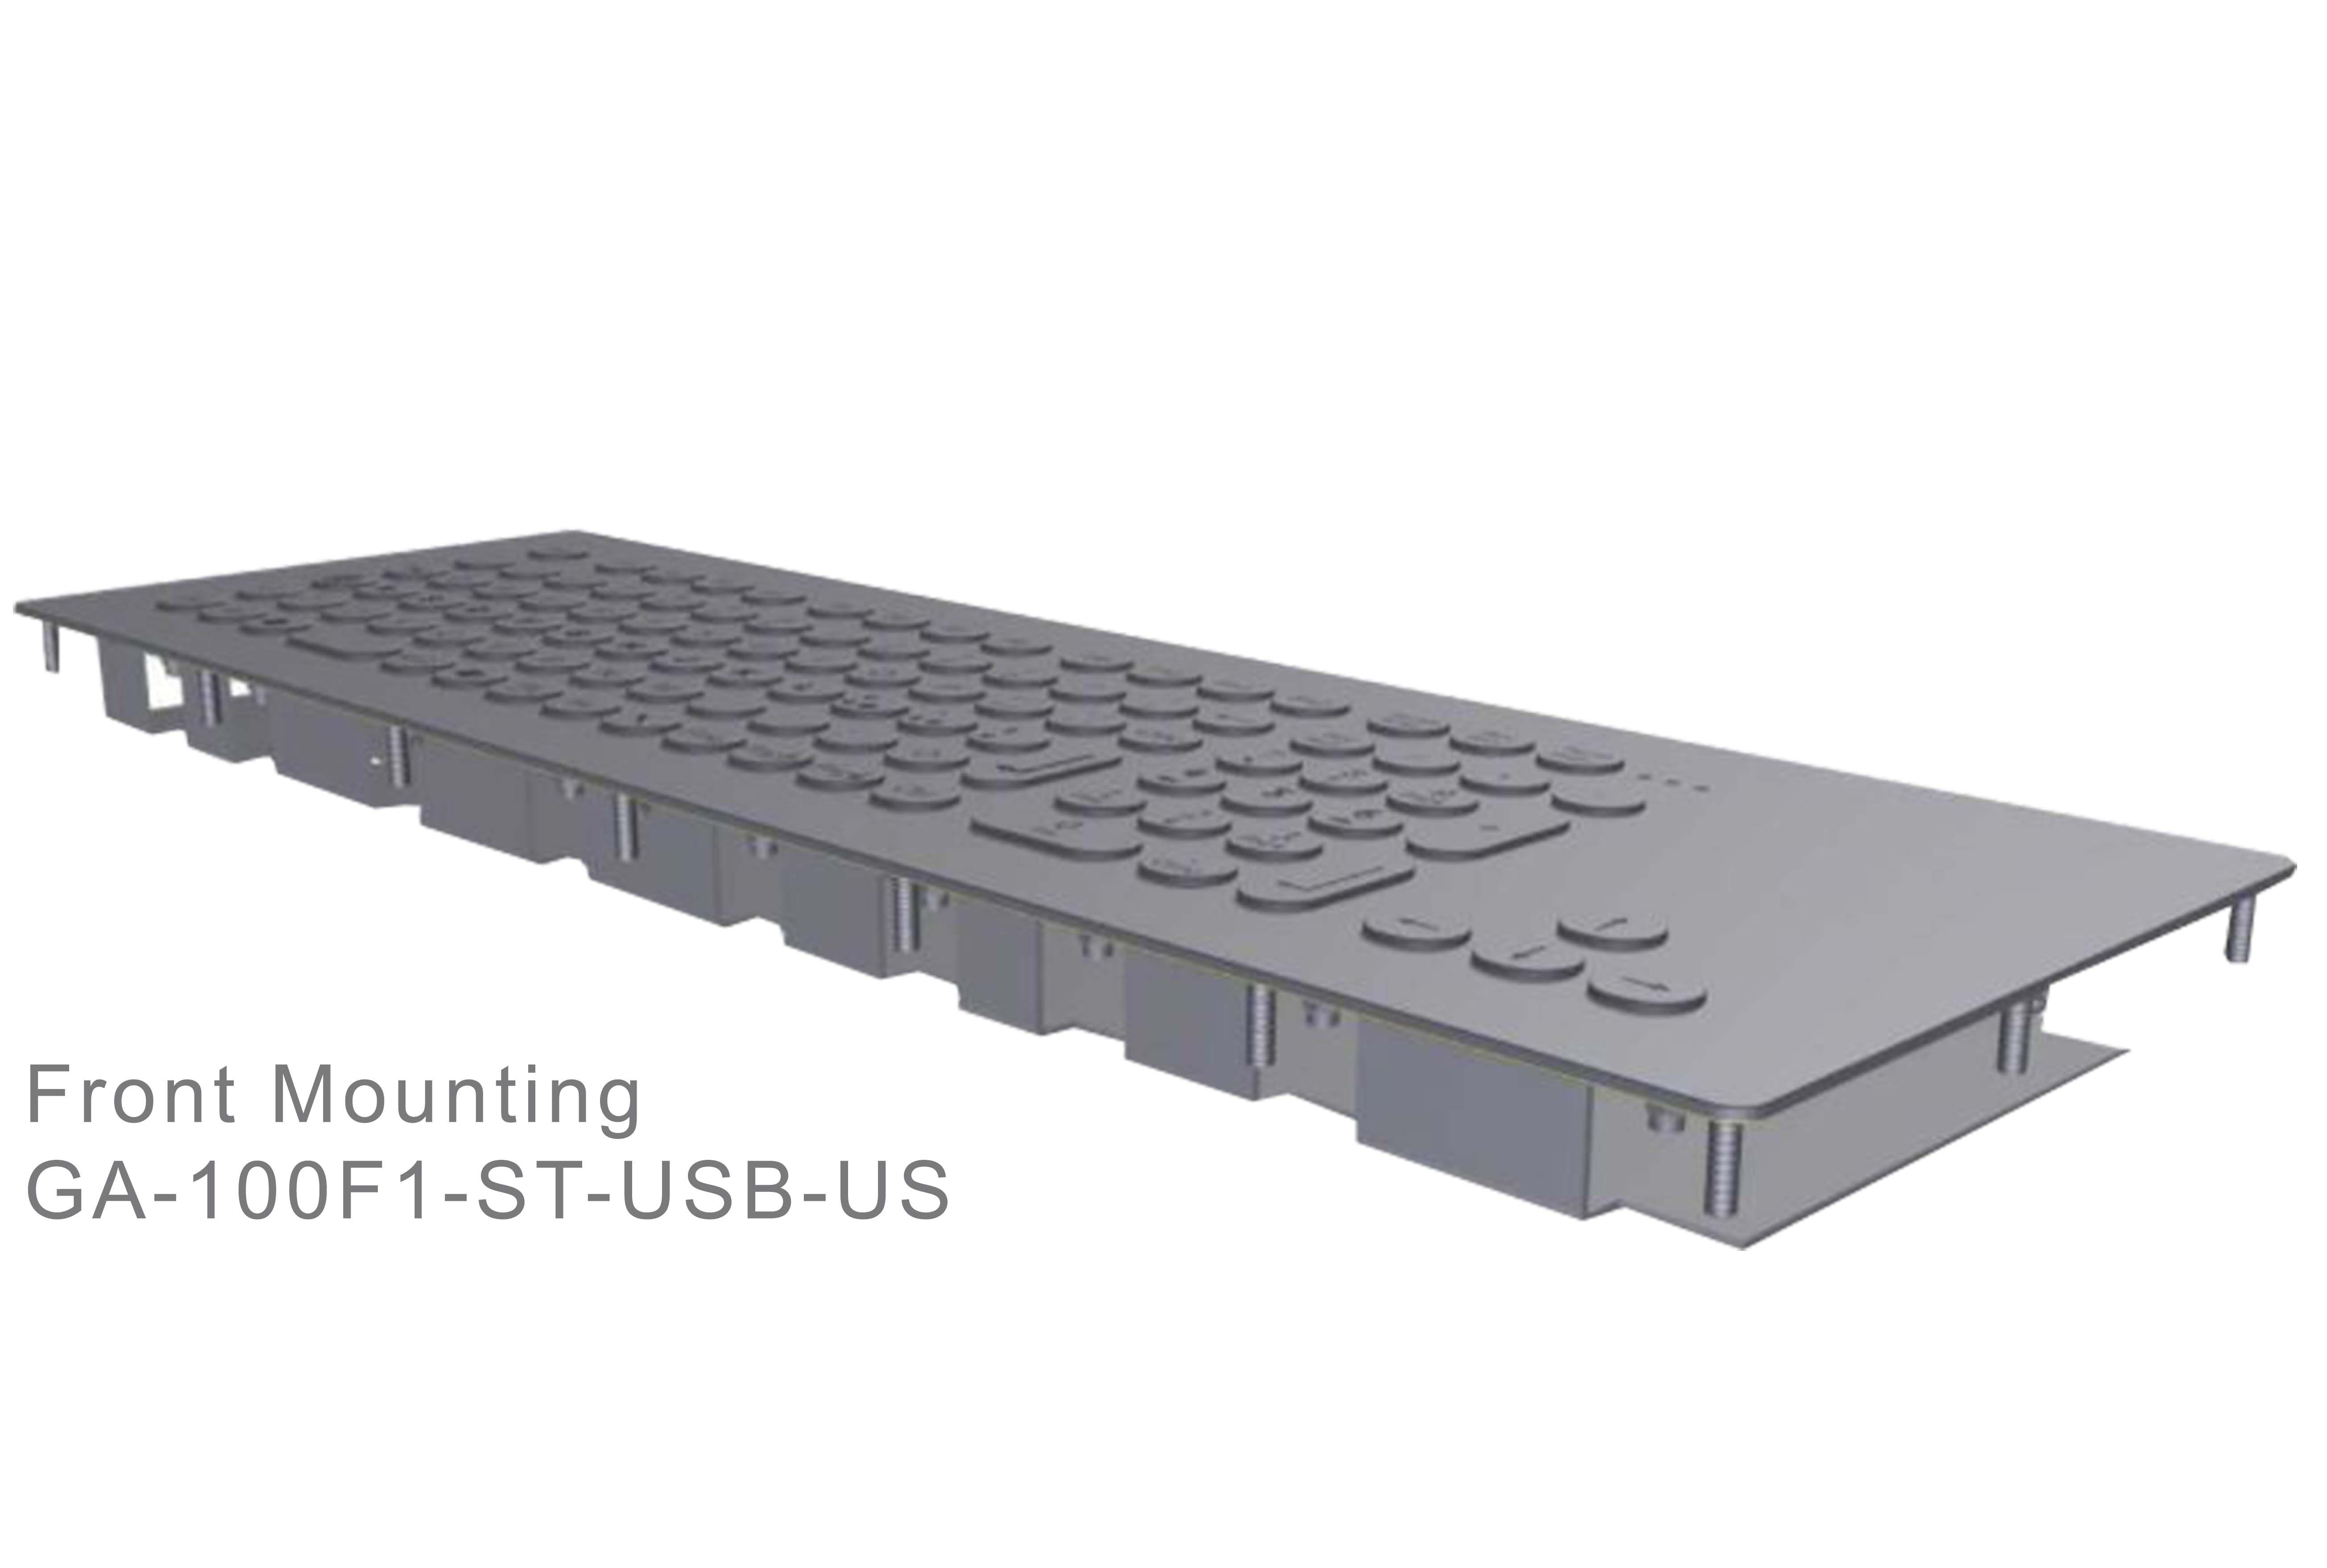 GA-Industrial-Italian Brand-100+Keys Front Mounting-L